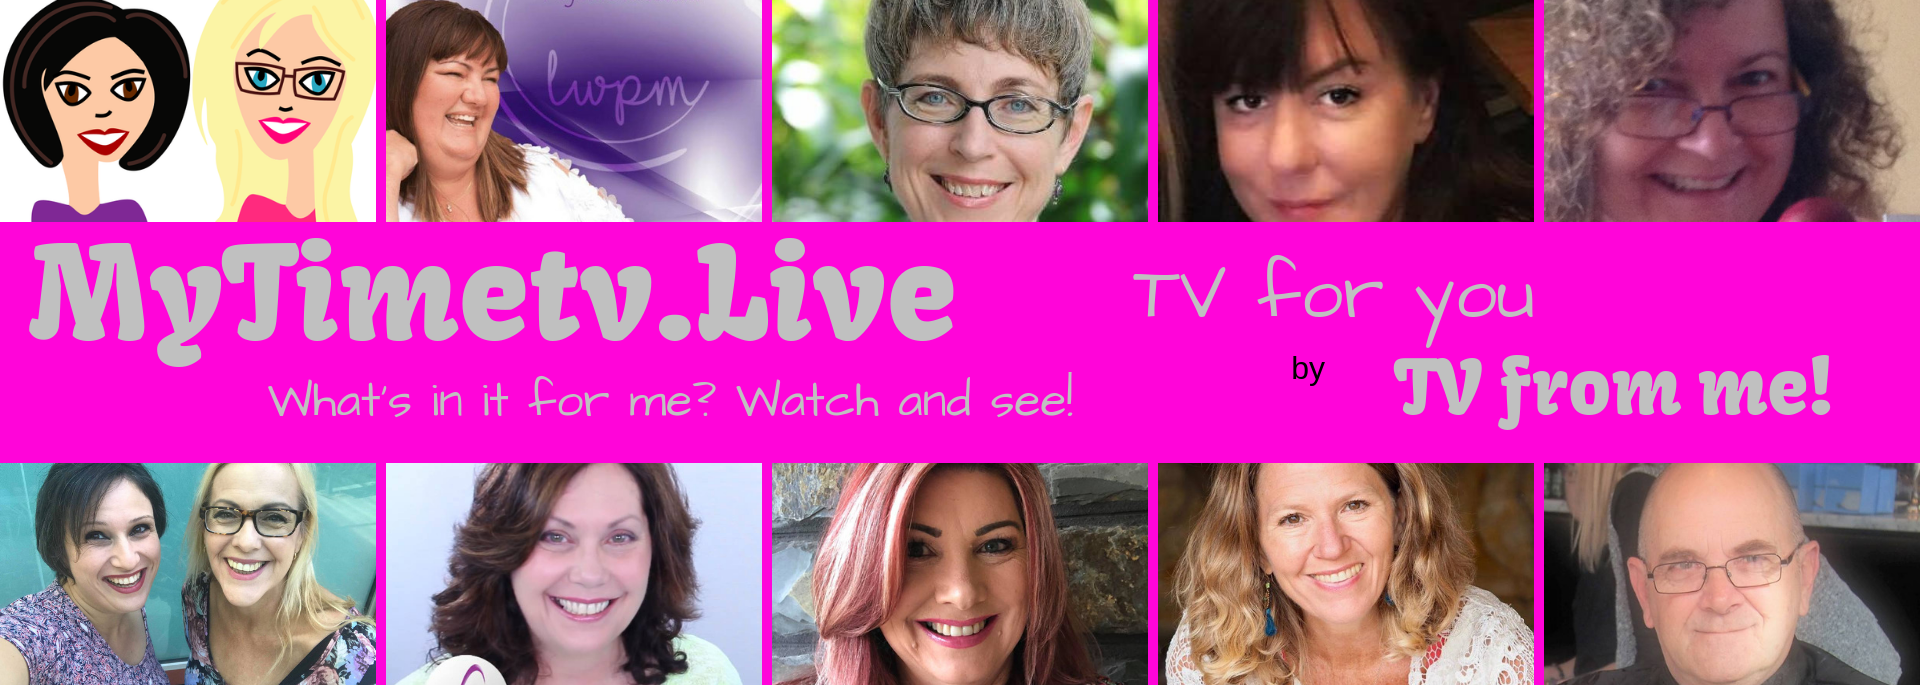 MyTimetv.Live channel